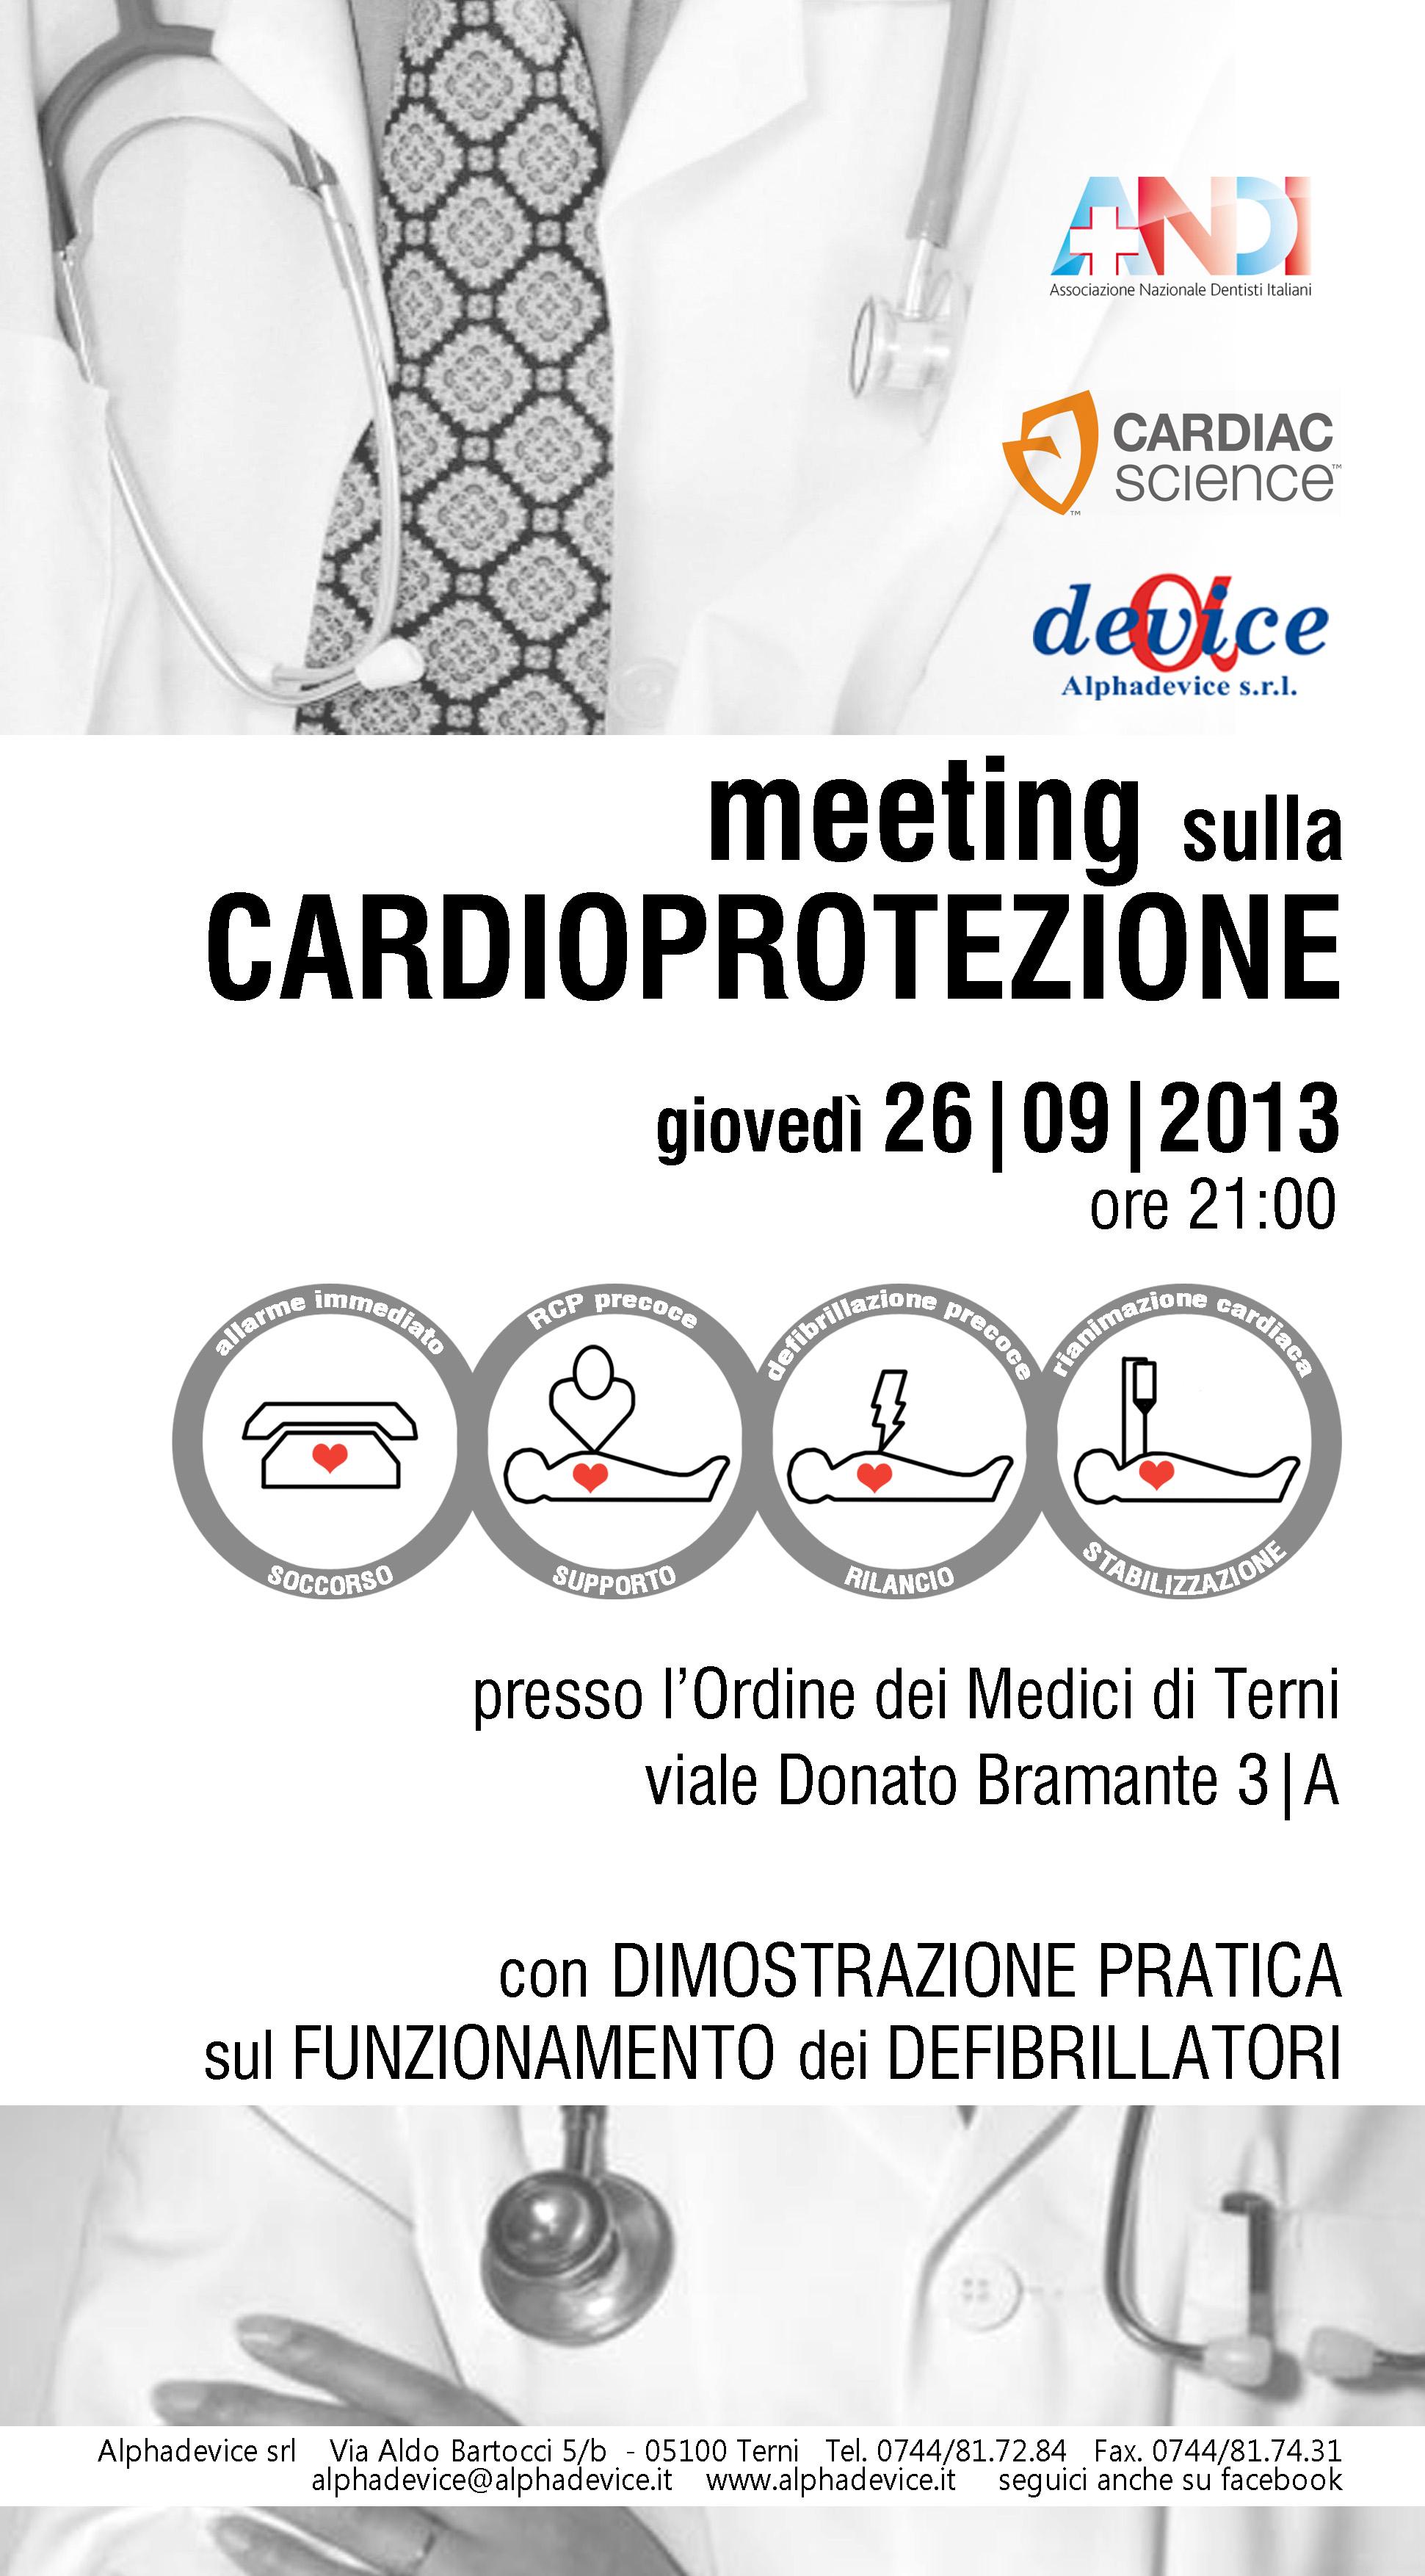 LOCANDINA MEETING CARDIO_def.01.08.13